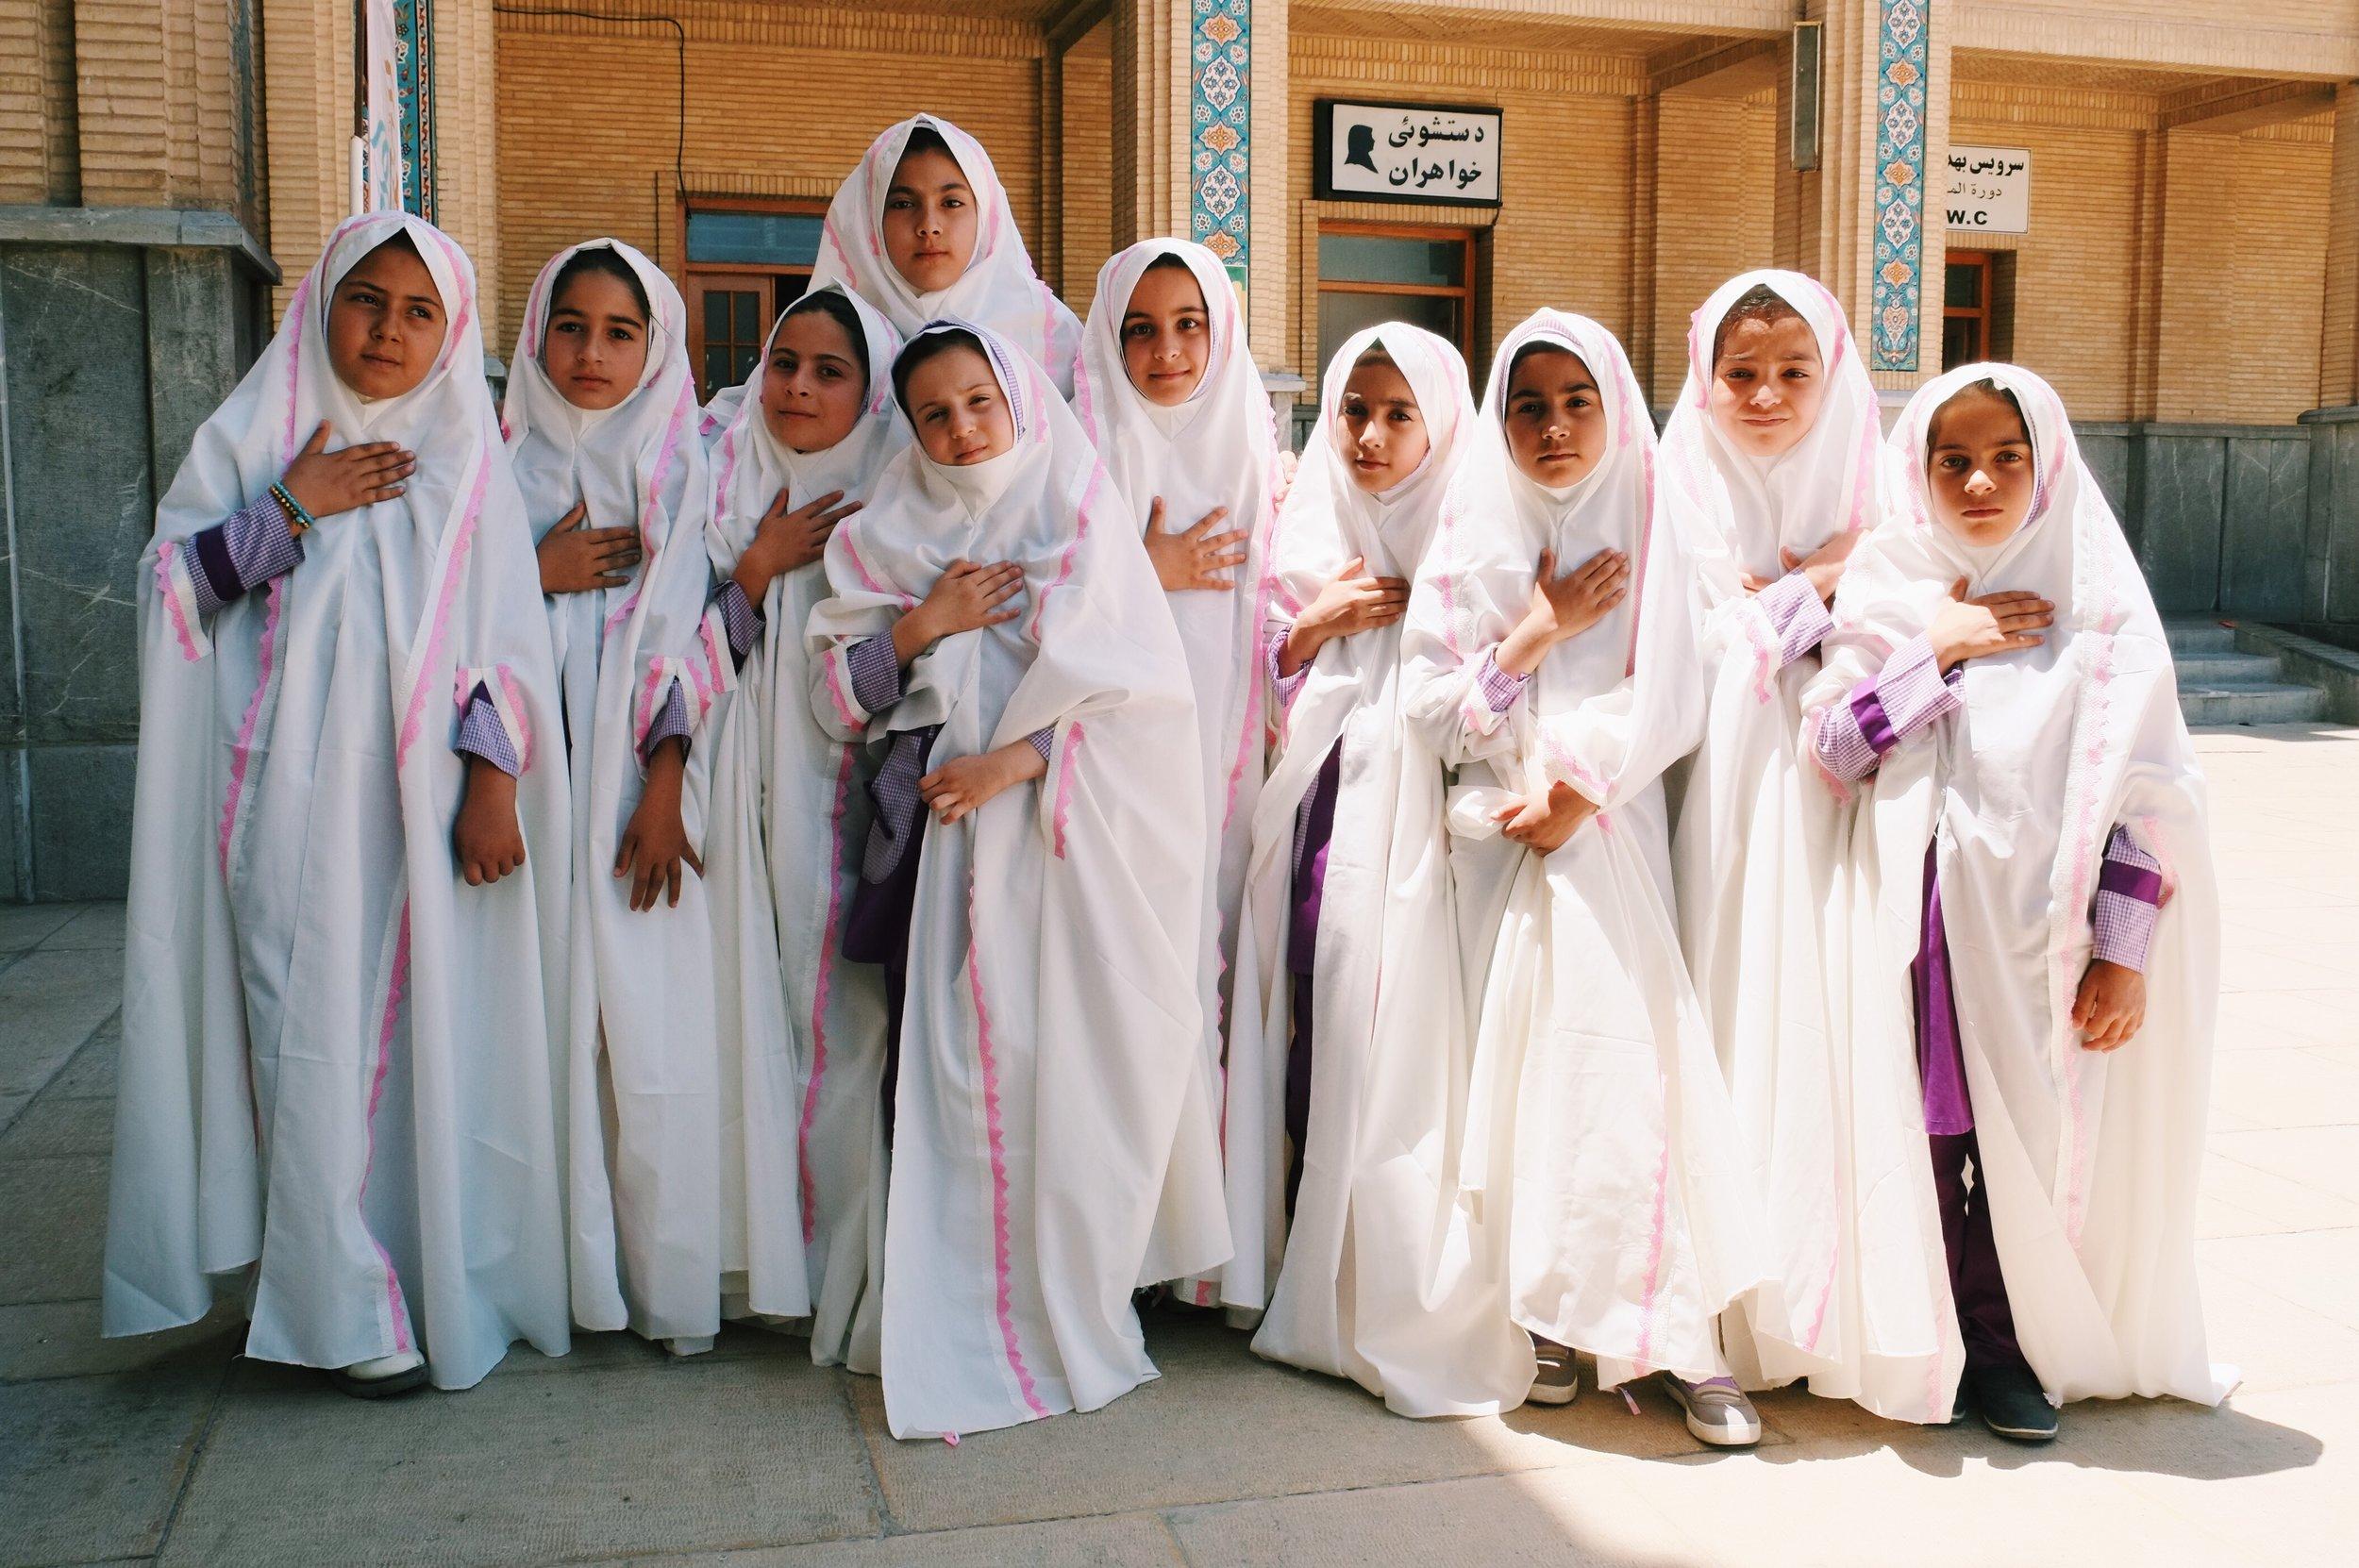 Pious girls in Iran by Joost Bastmeijer.jpeg